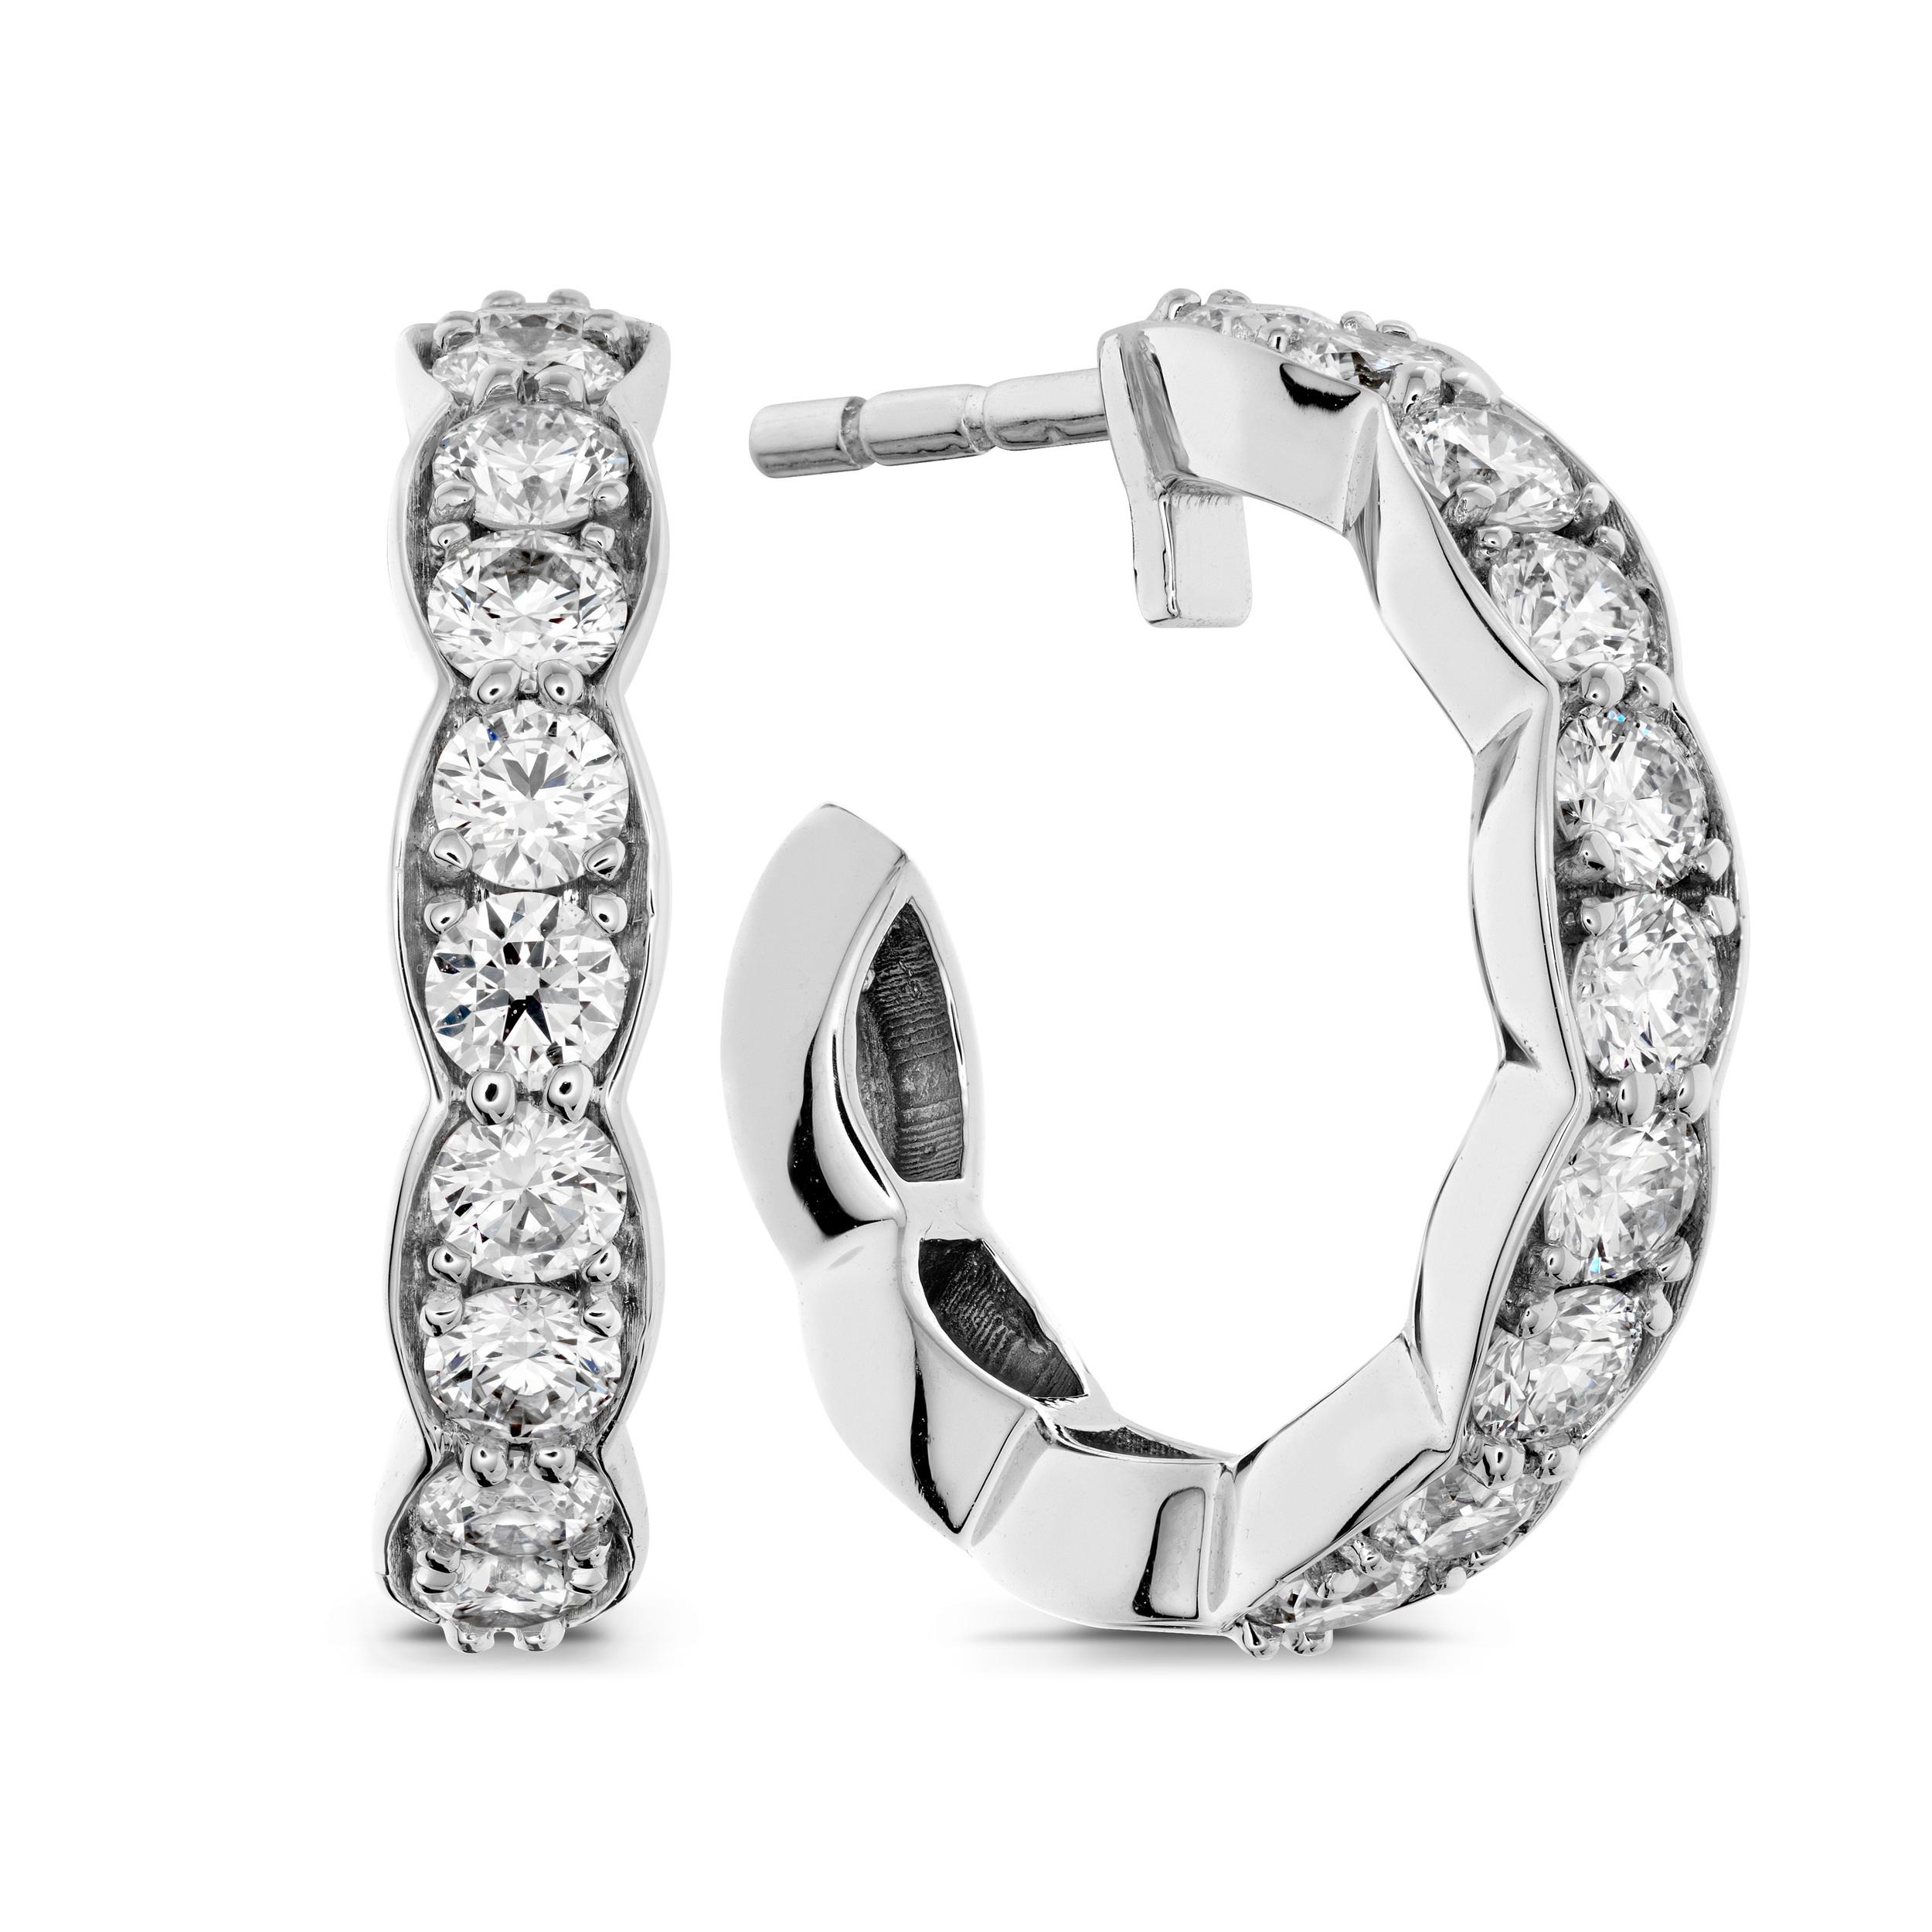 Hearts on Fire Earrings   Van Gundys   Camarillo Jewelers